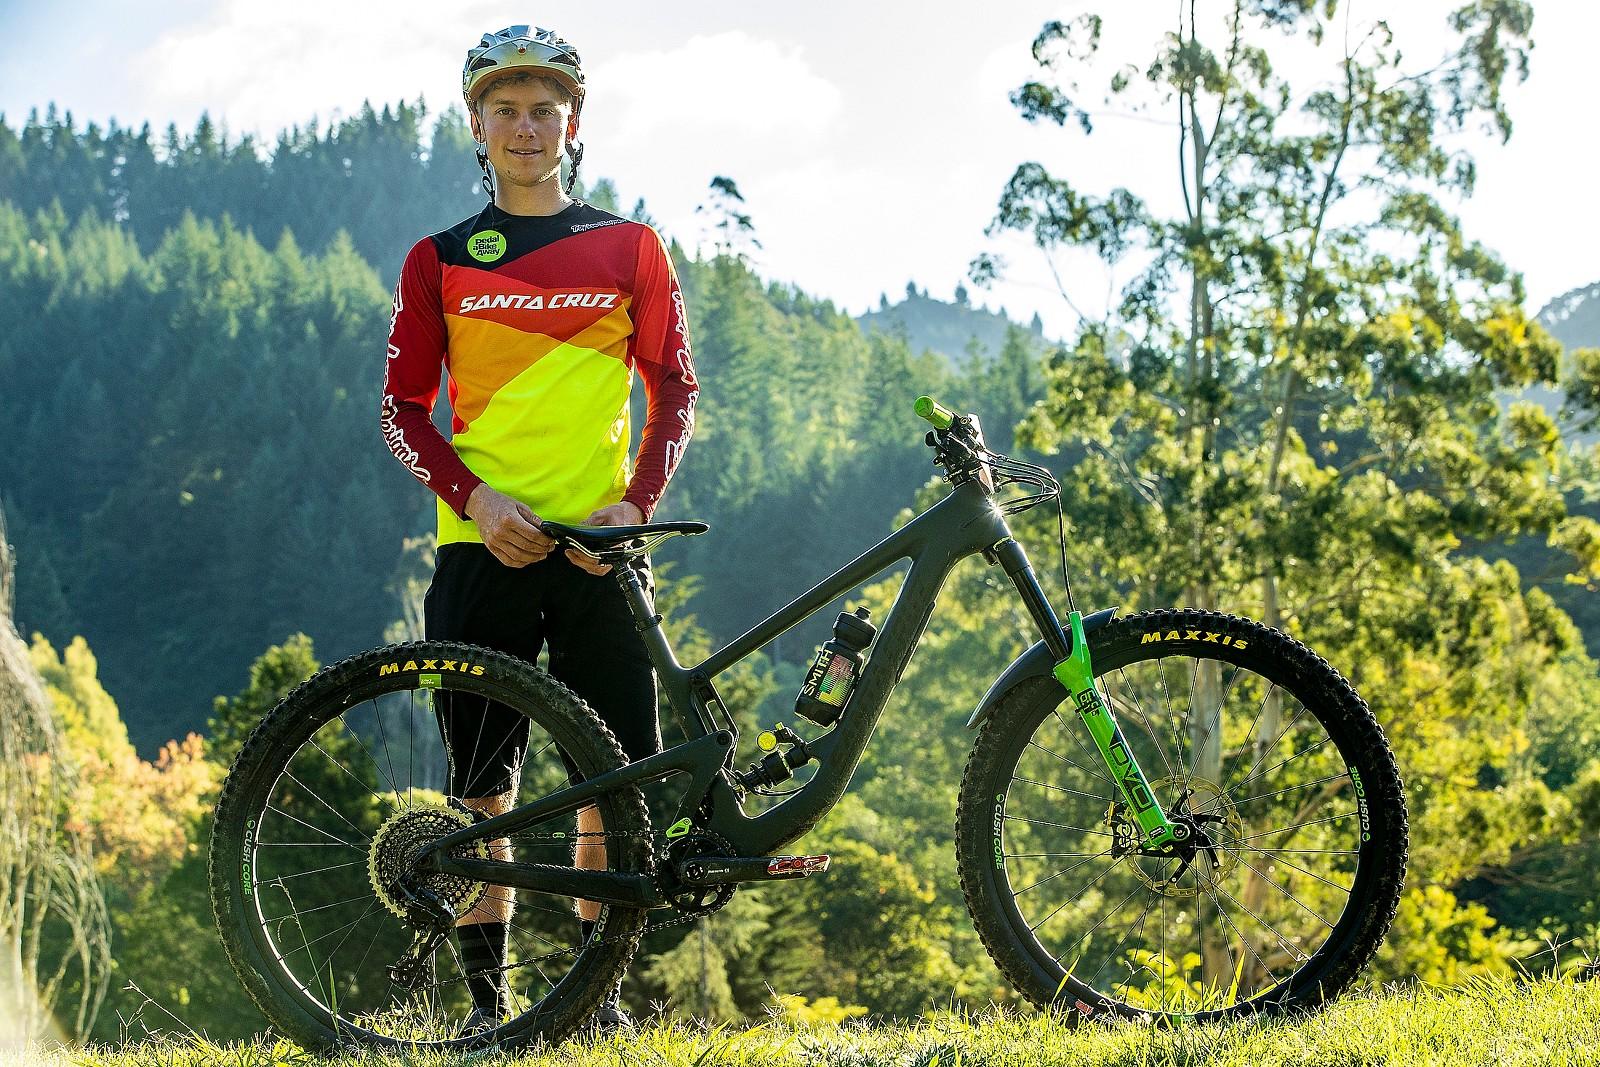 WINNING BIKE - Brady Stone's Santa Cruz Megatower - WINNING BIKE - Brady Stone's Santa Cruz Megatower - Mountain Biking Pictures - Vital MTB